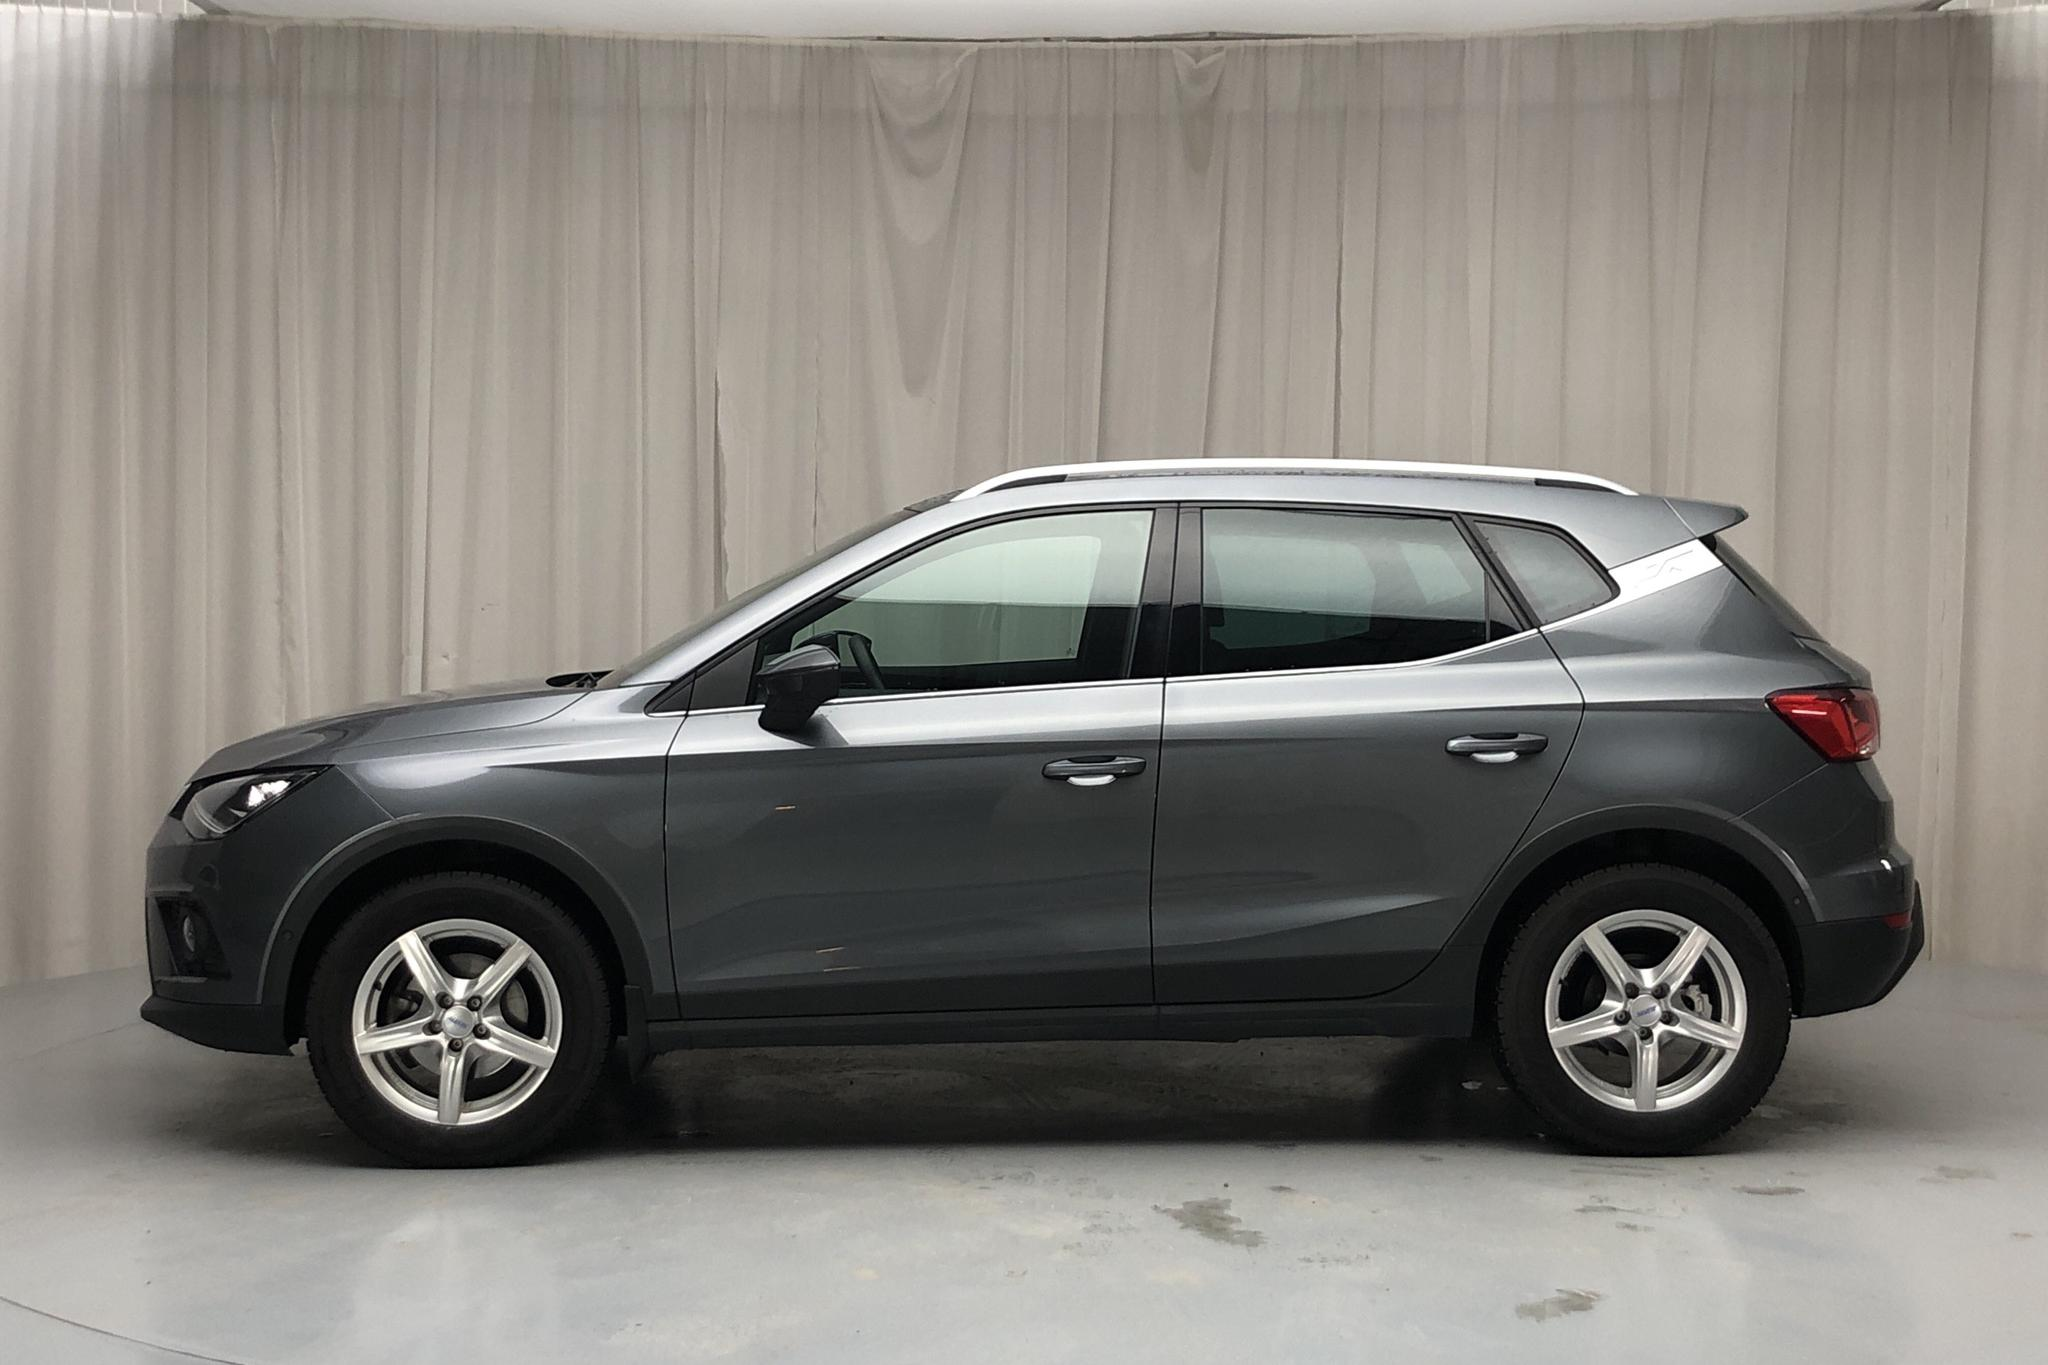 Seat Arona 1.0 TSI (115hk) - 1 855 mil - Manuell - grå - 2018